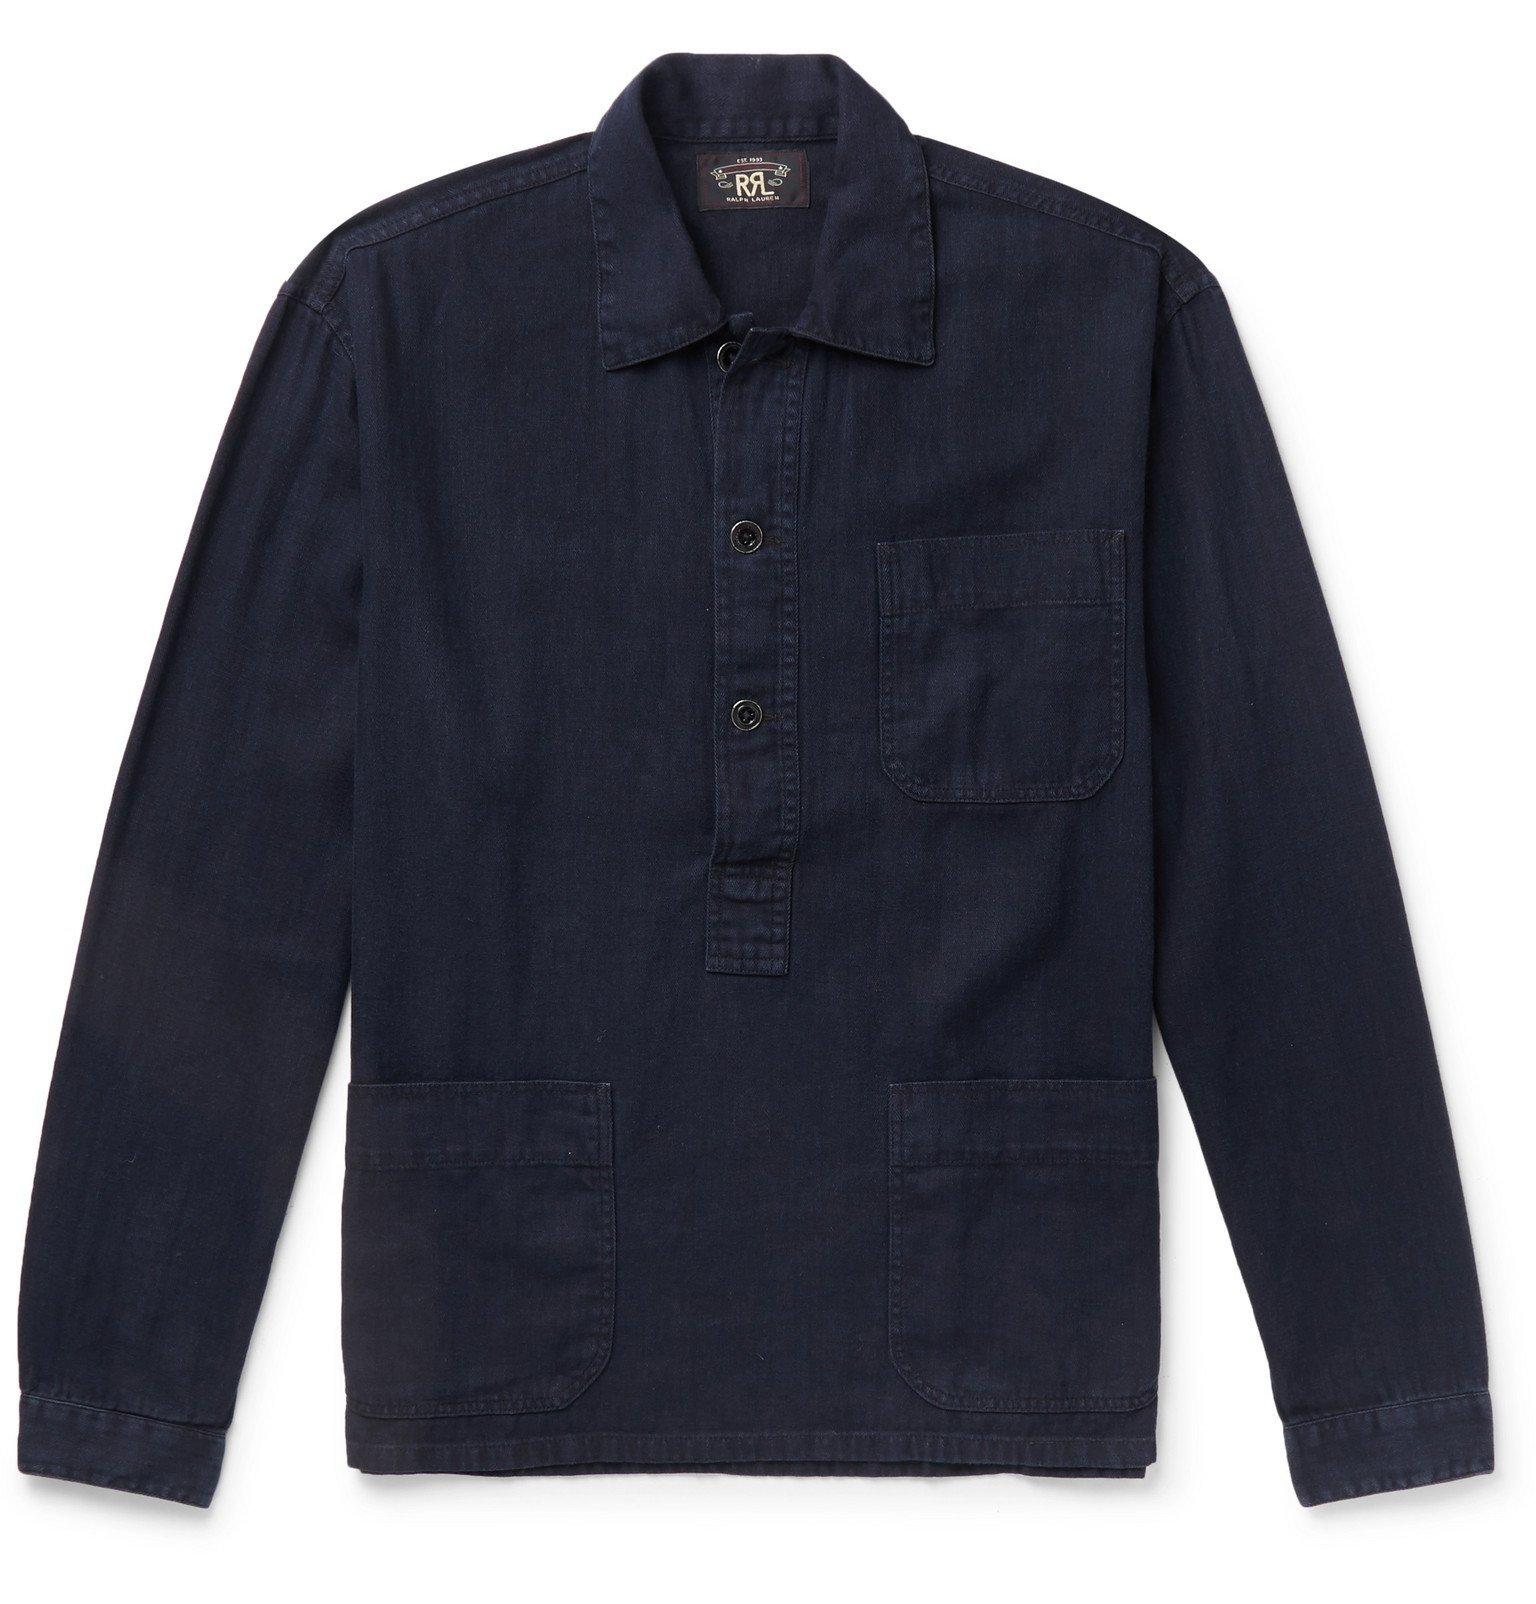 RRL - Linen and Cotton-Blend Shirt - Blue